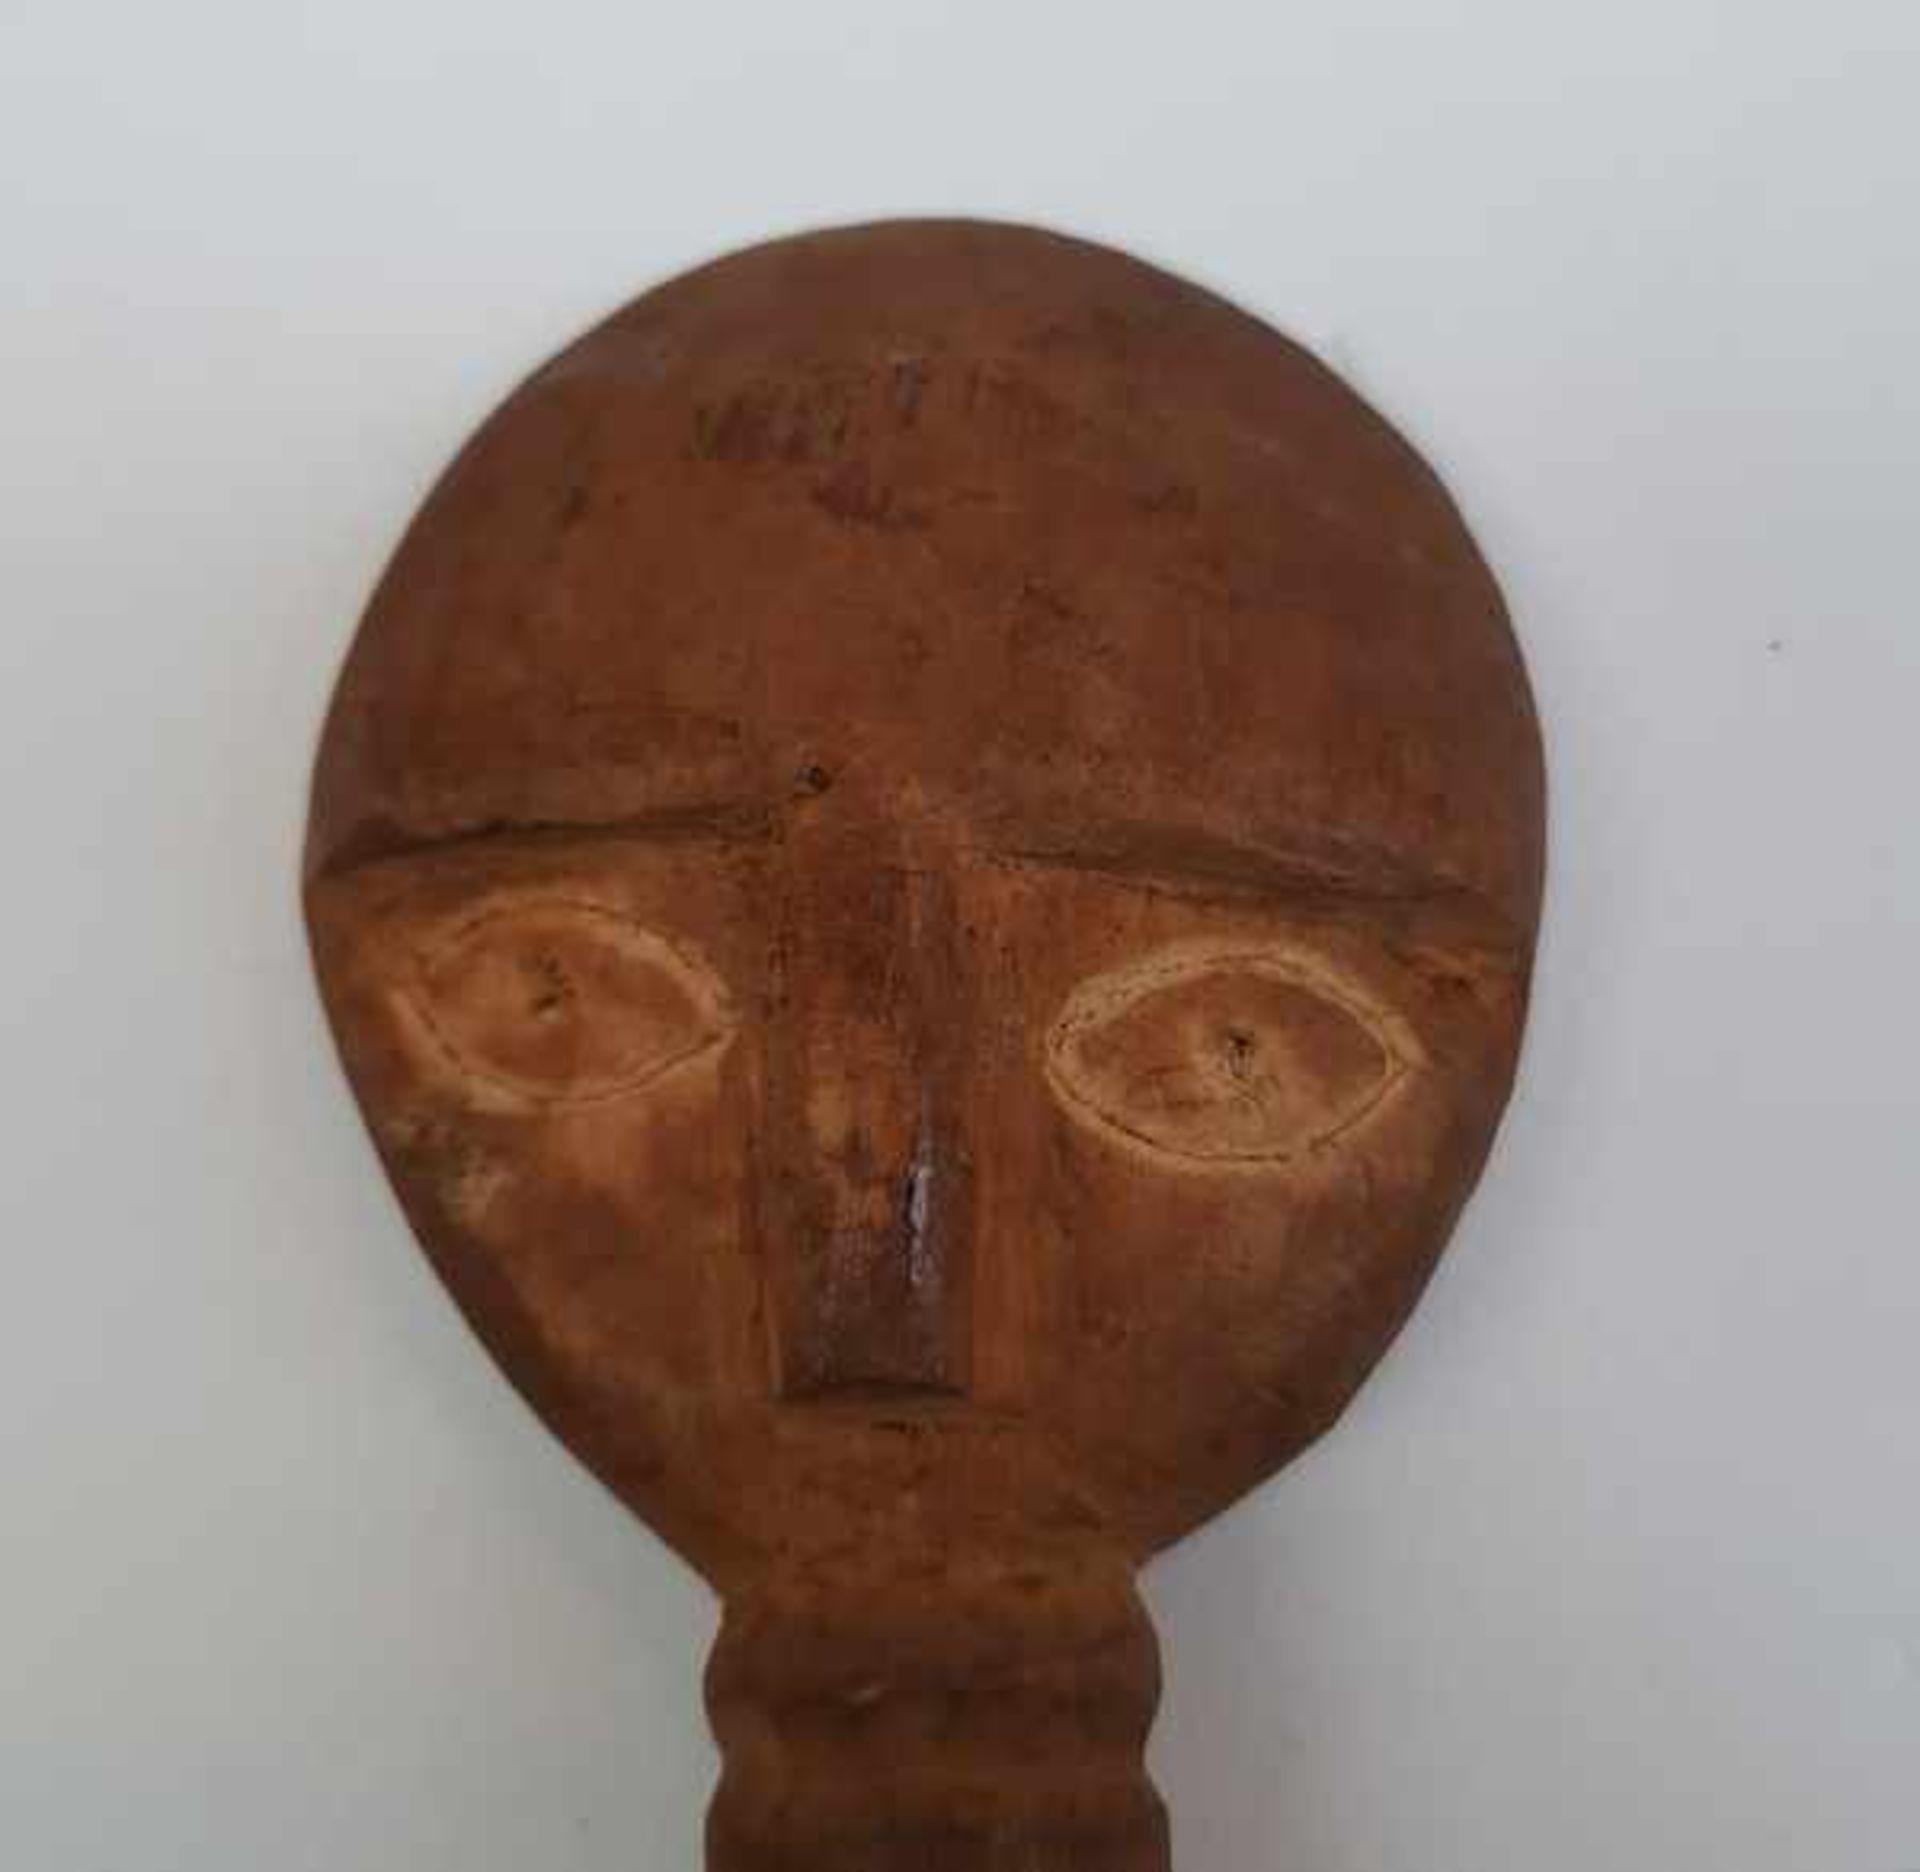 Los 152 - (Etnografica) Hout, Akuaba Ashanti dolls. Ghana Afrika